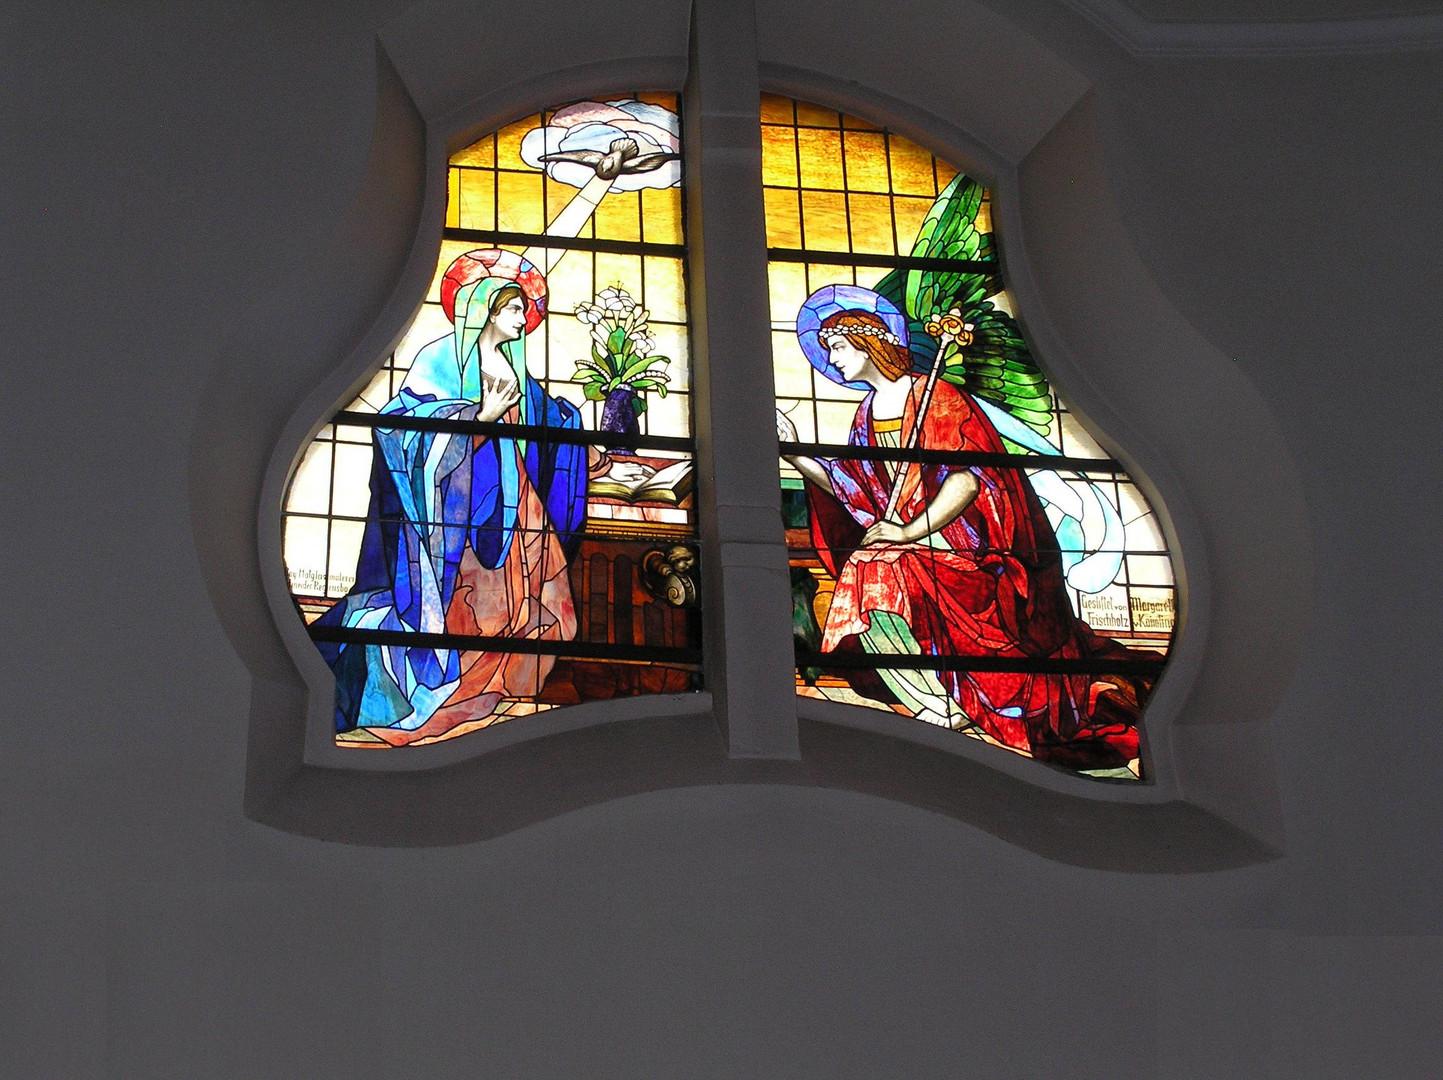 Maria Verkündung - Pfarrkirche Roggenstein